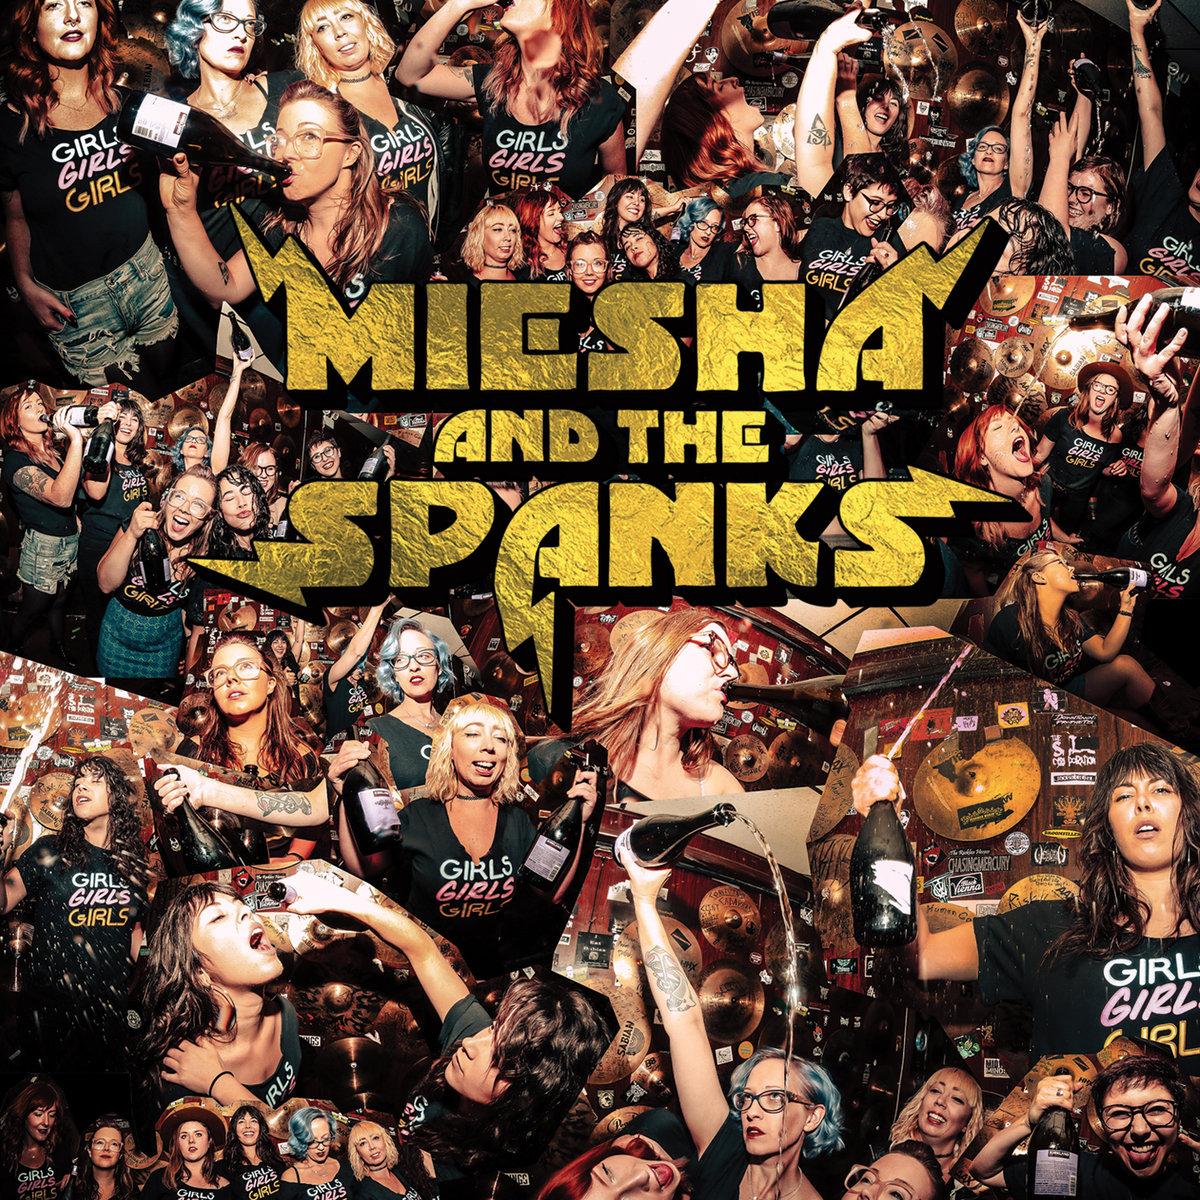 Miesha & The Spanks - Girls Girls Girls  Artwork by Richard MacFarlane